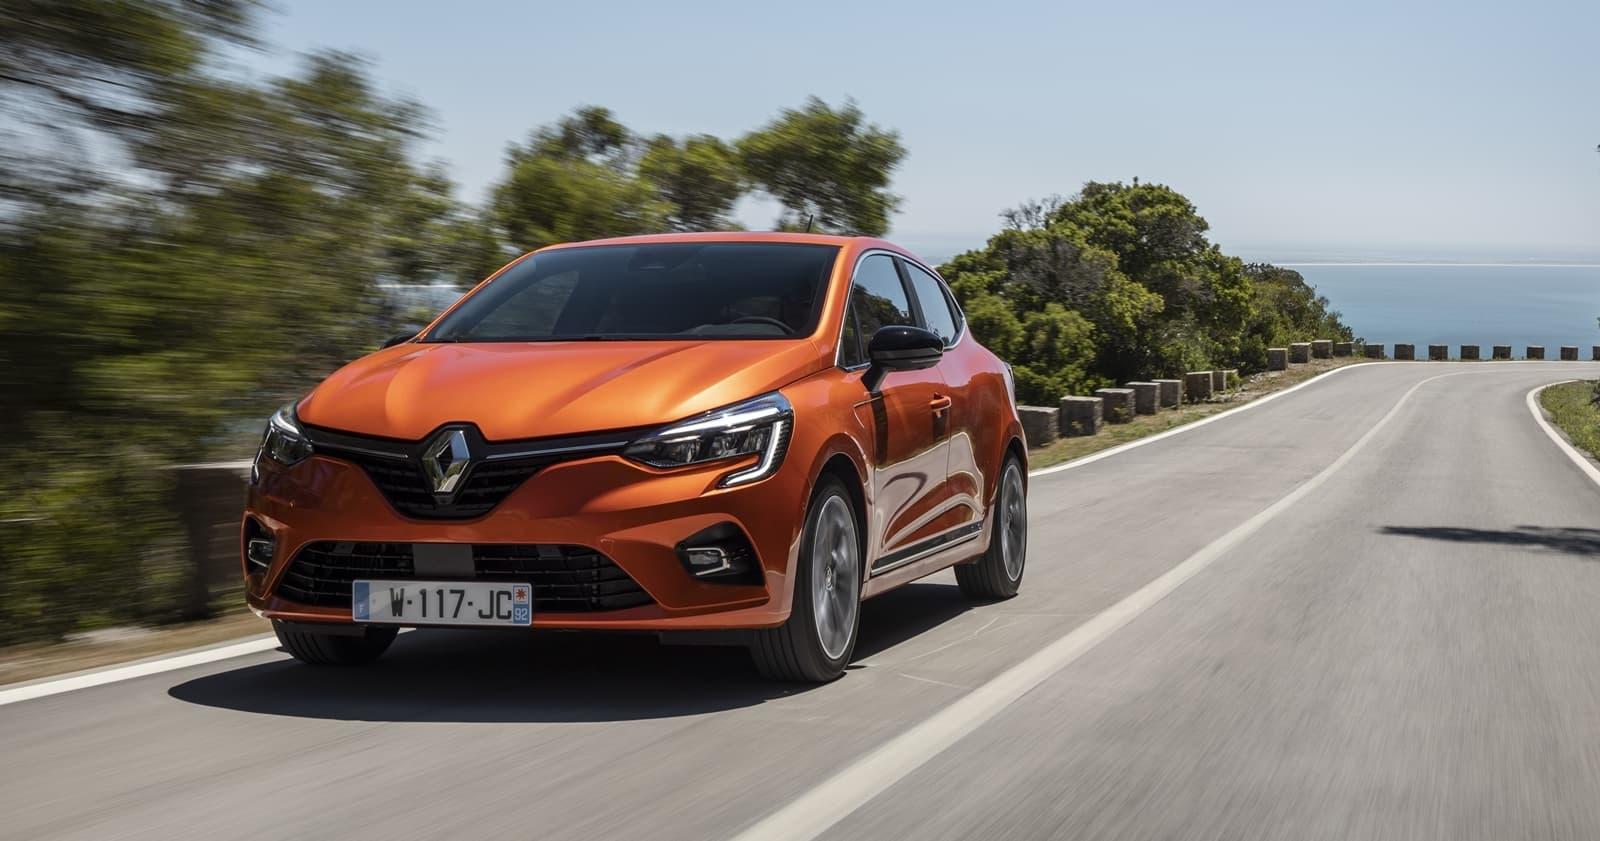 Renault Clio 2020 Prueba 0619 005